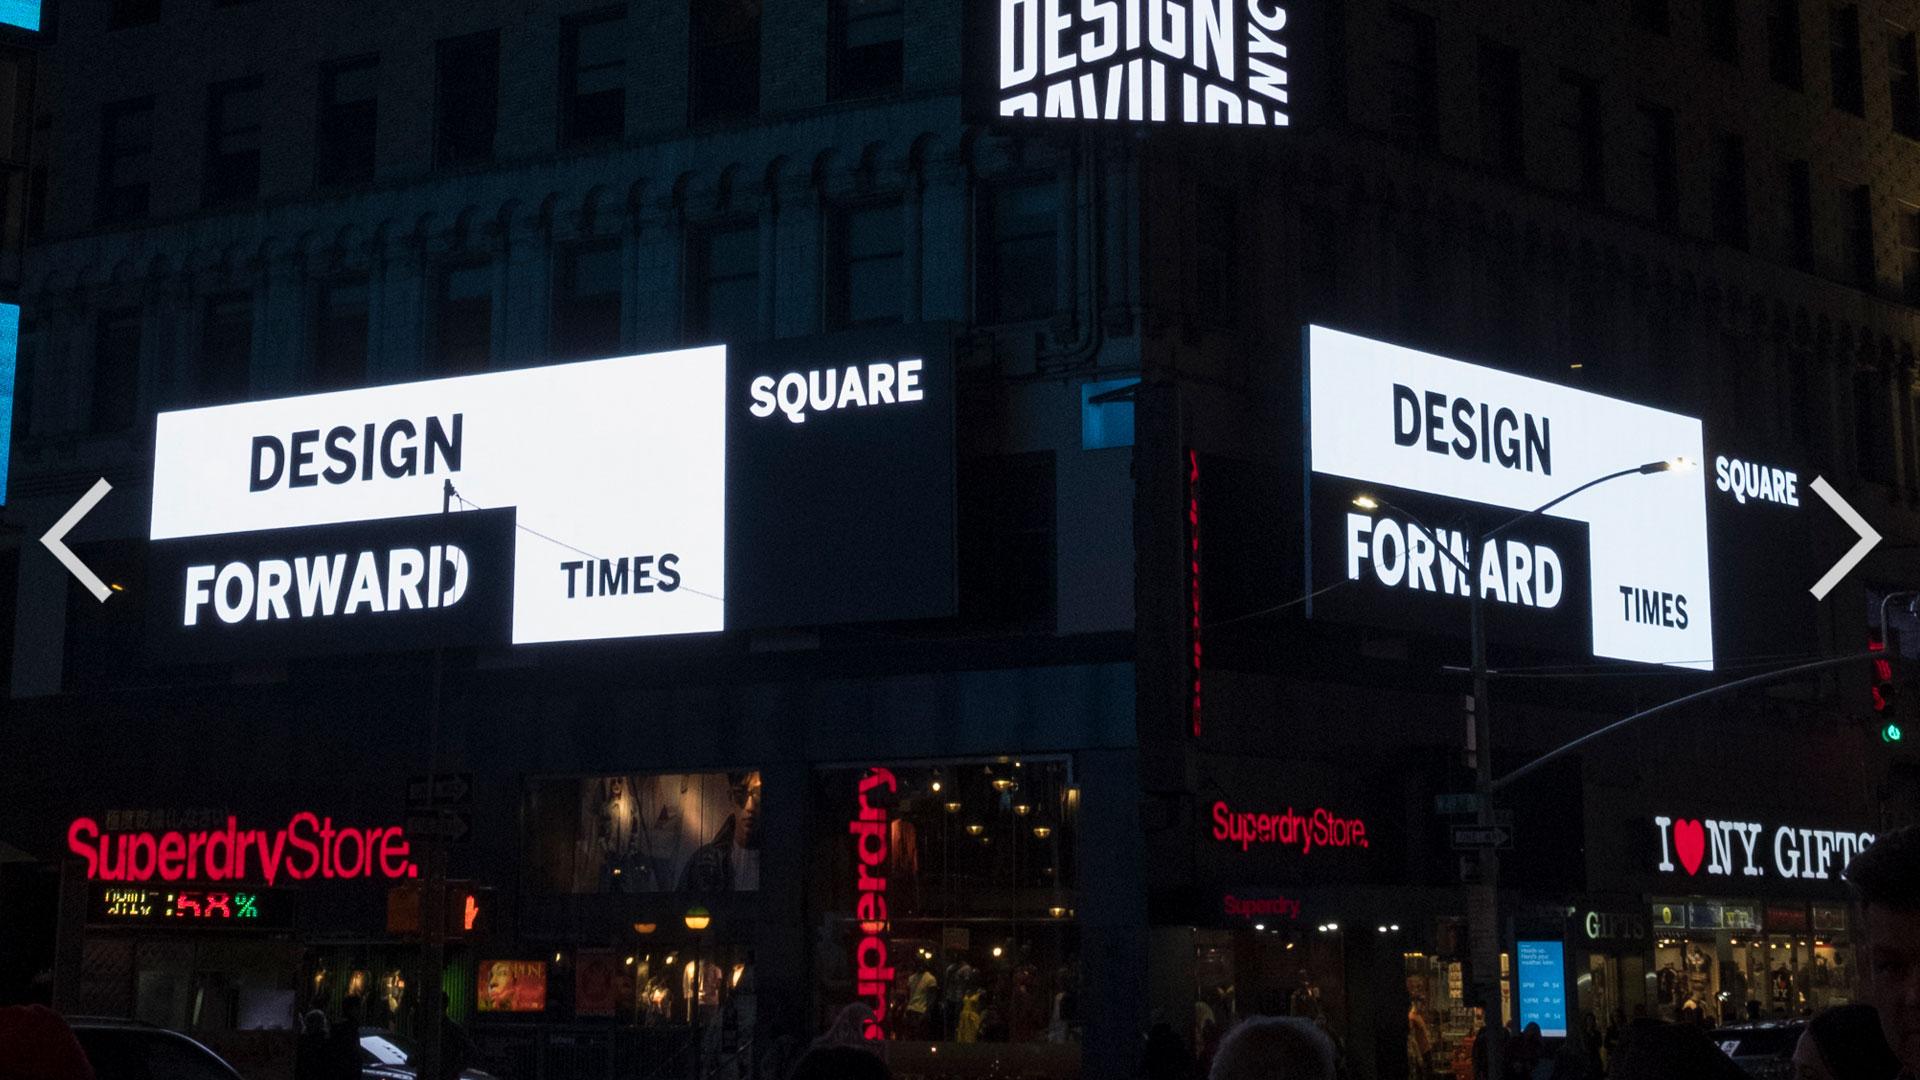 Superior Digital Displays